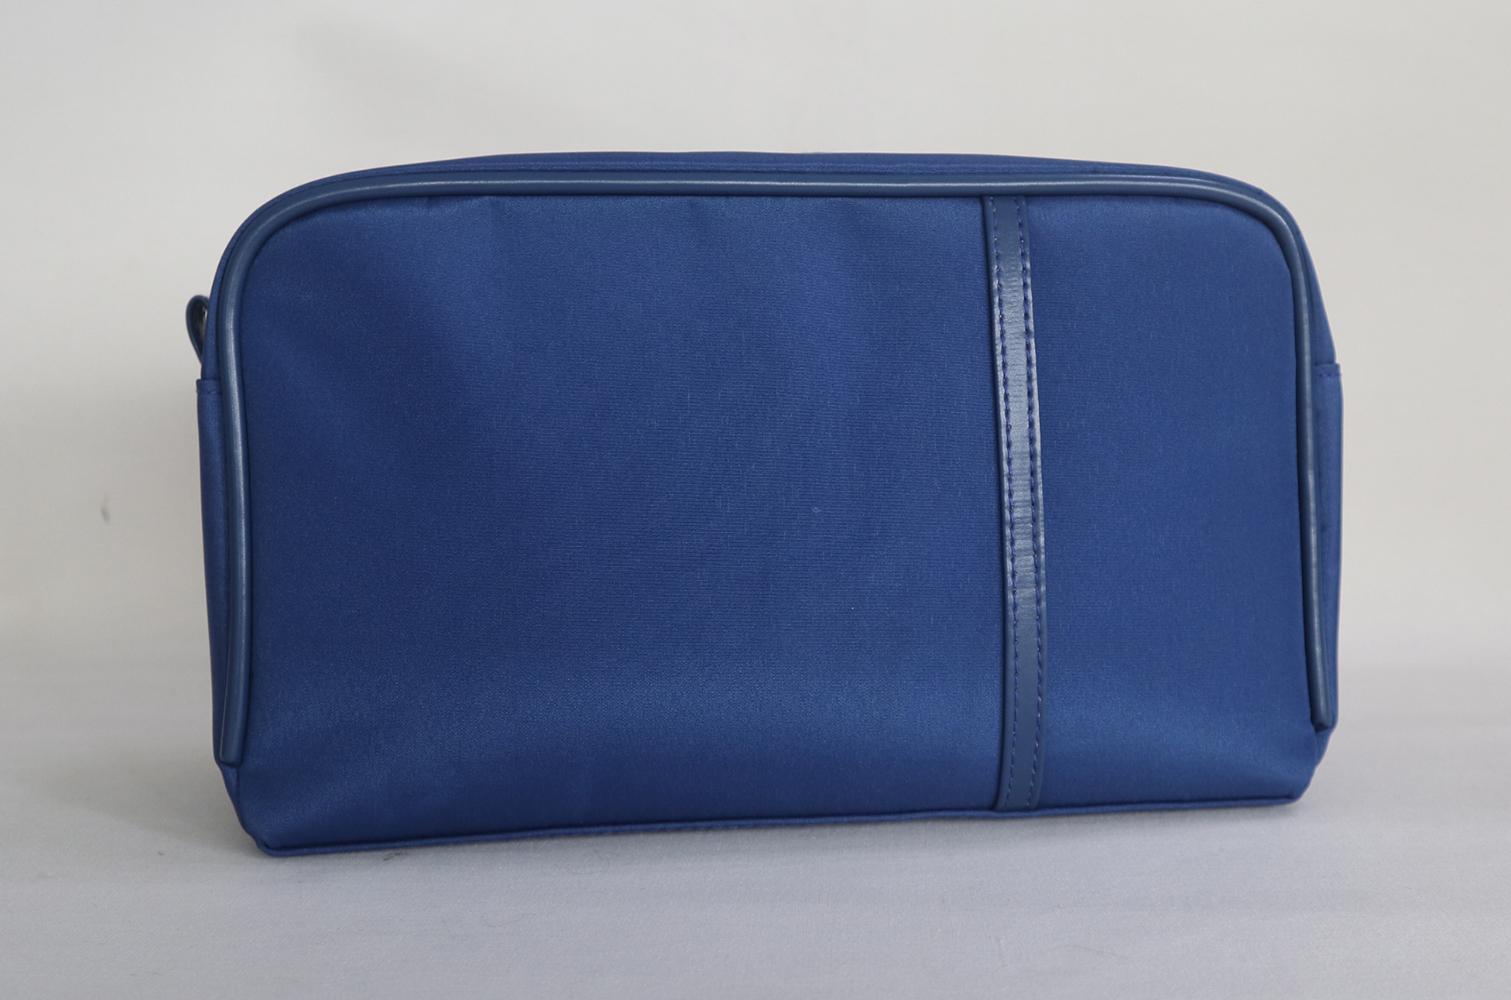 Navy microfiber large men makeup bag for travel with slim PU band at front